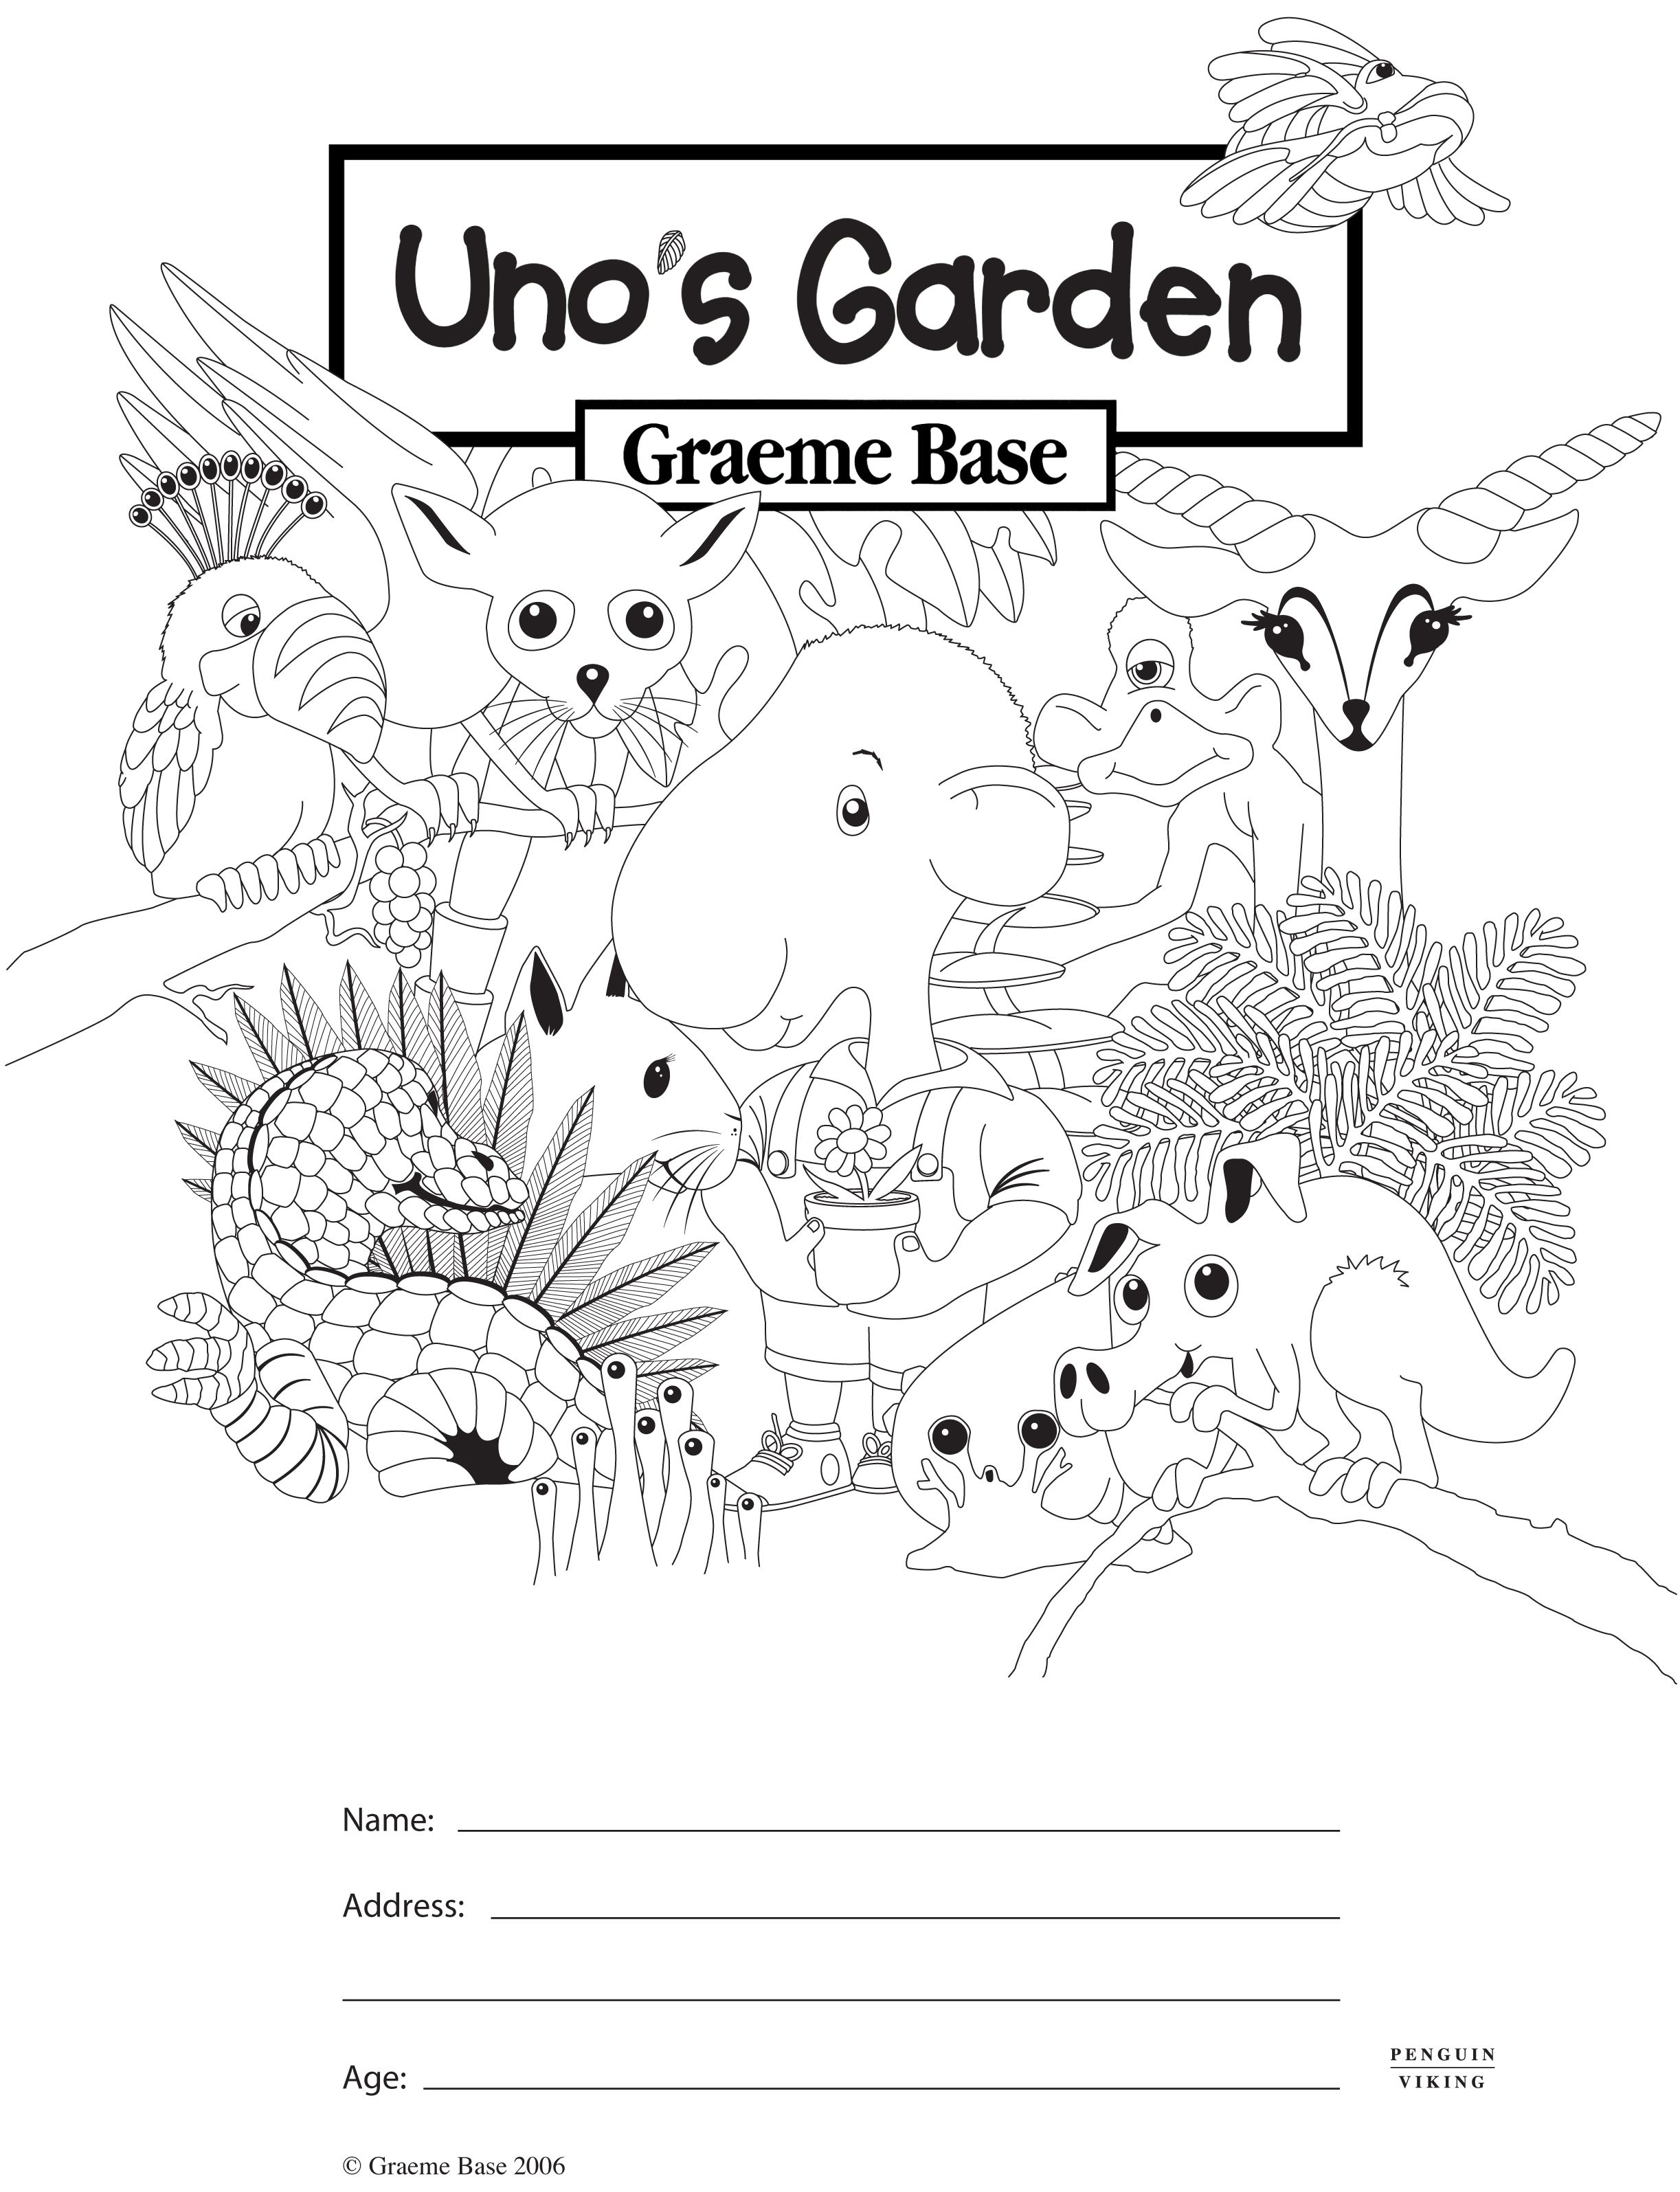 Uno's Garden Colouring In http://www.puffin.com.au/files